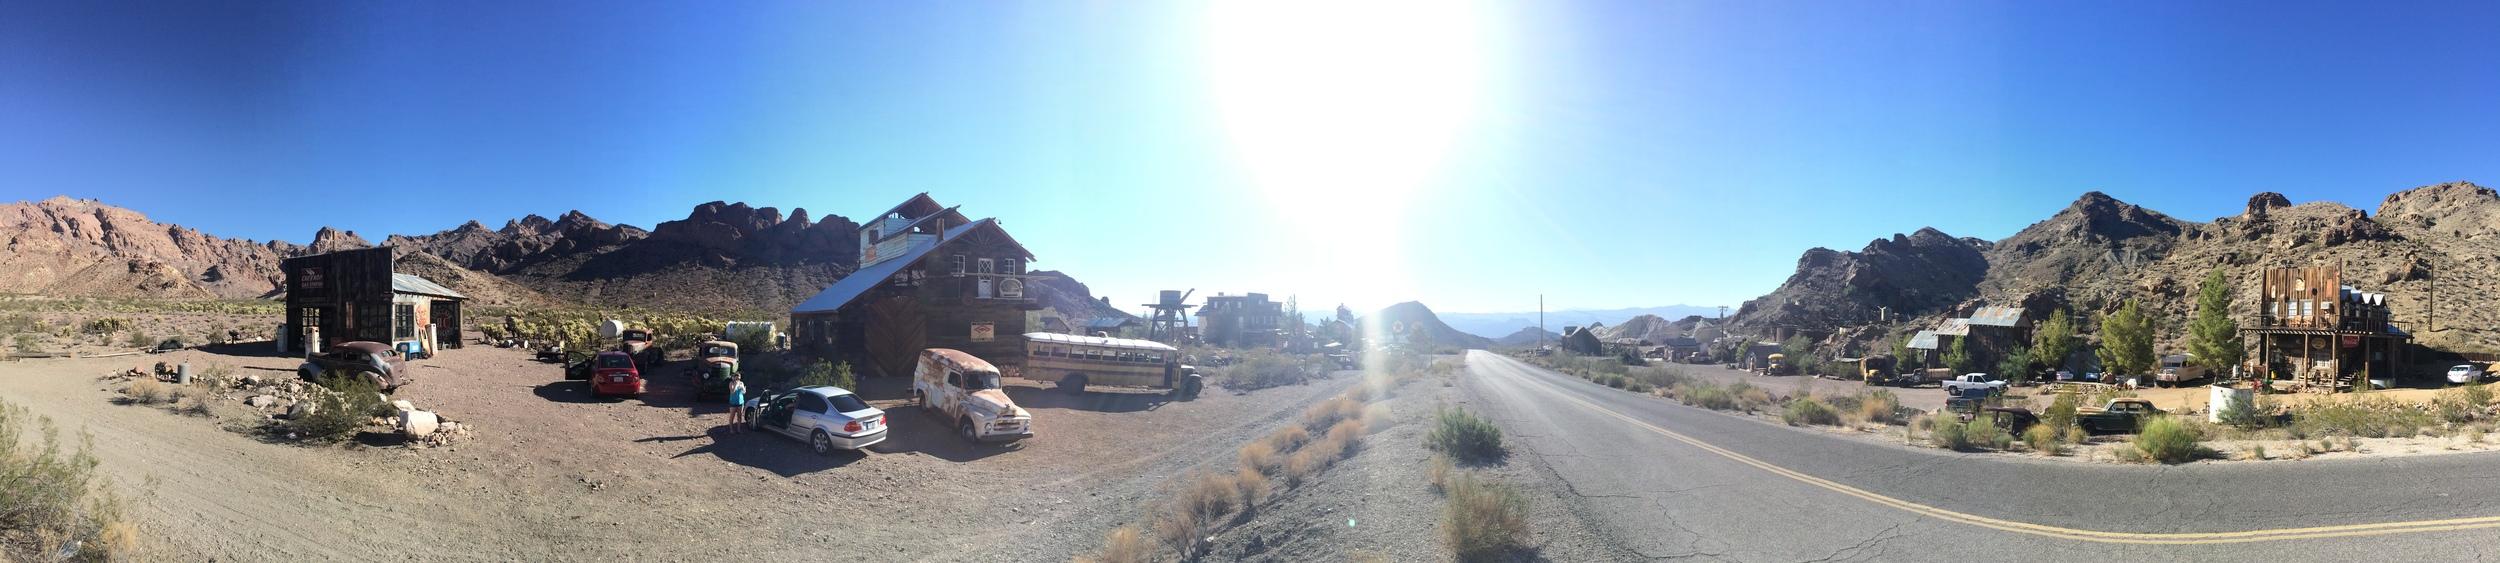 Our workshop shooting location, in Eldorado Canyon.